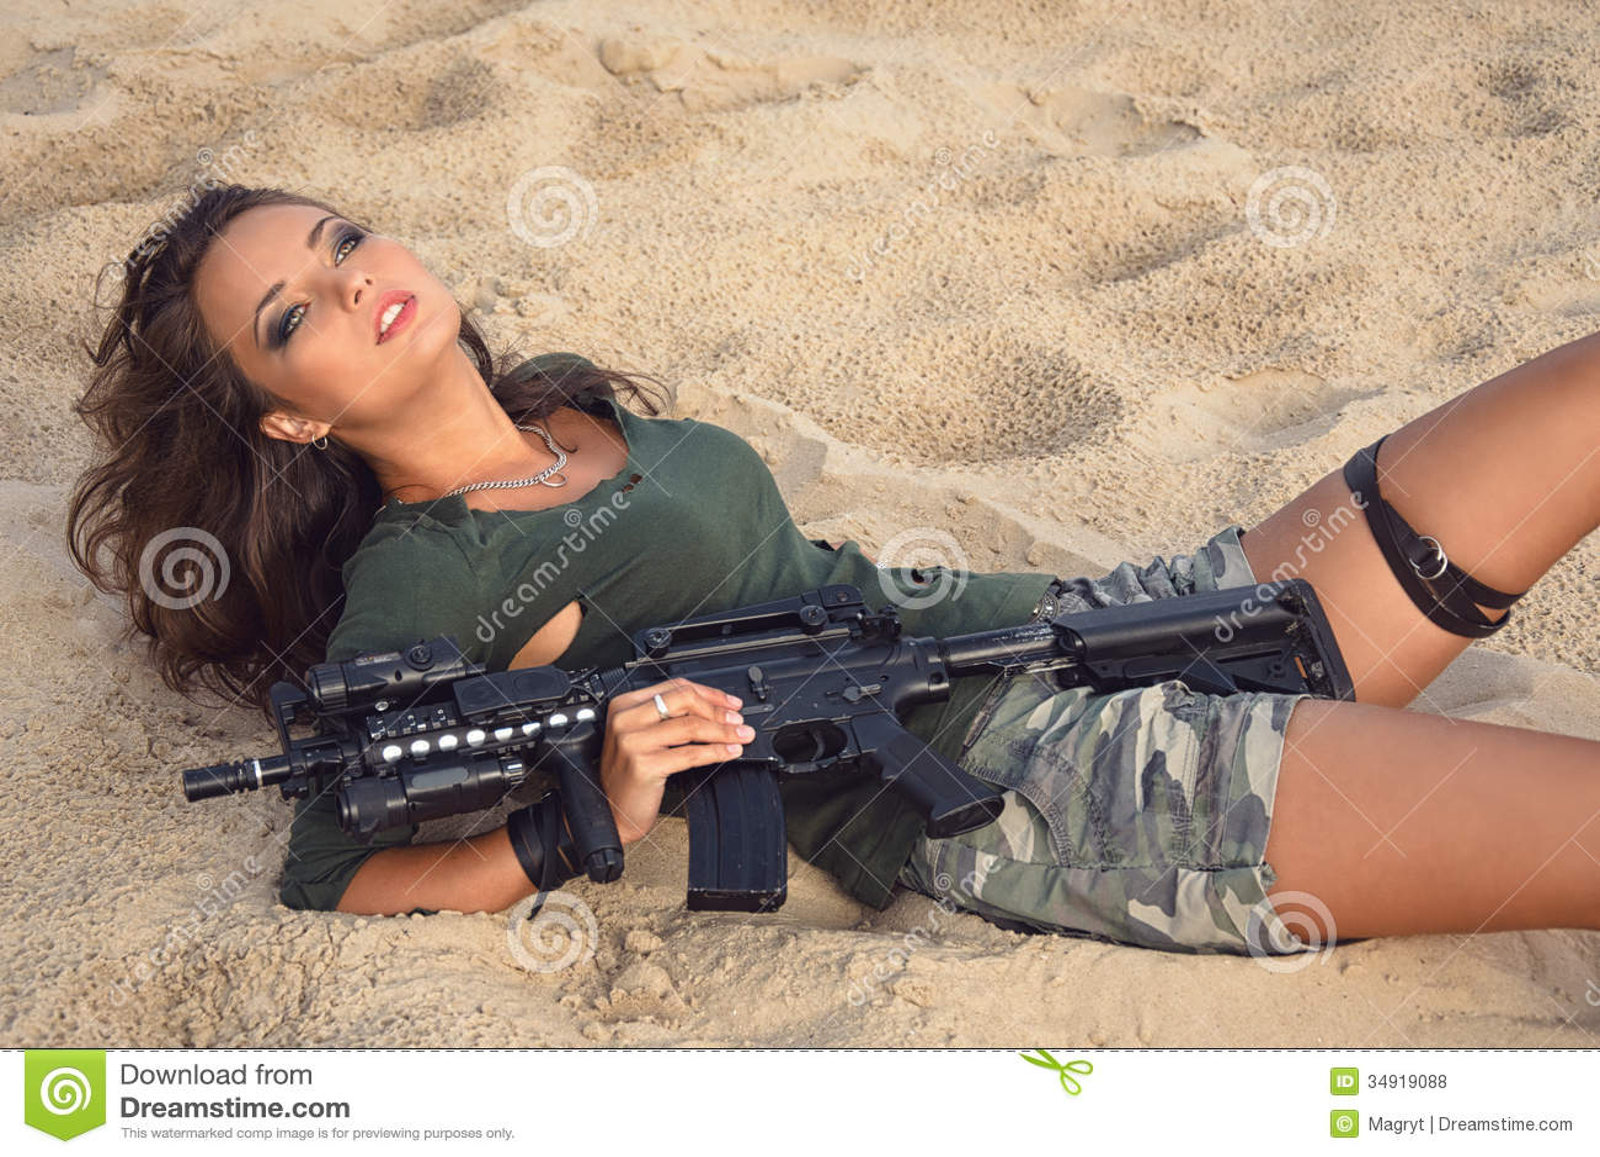 gun and Sexy camo with girl